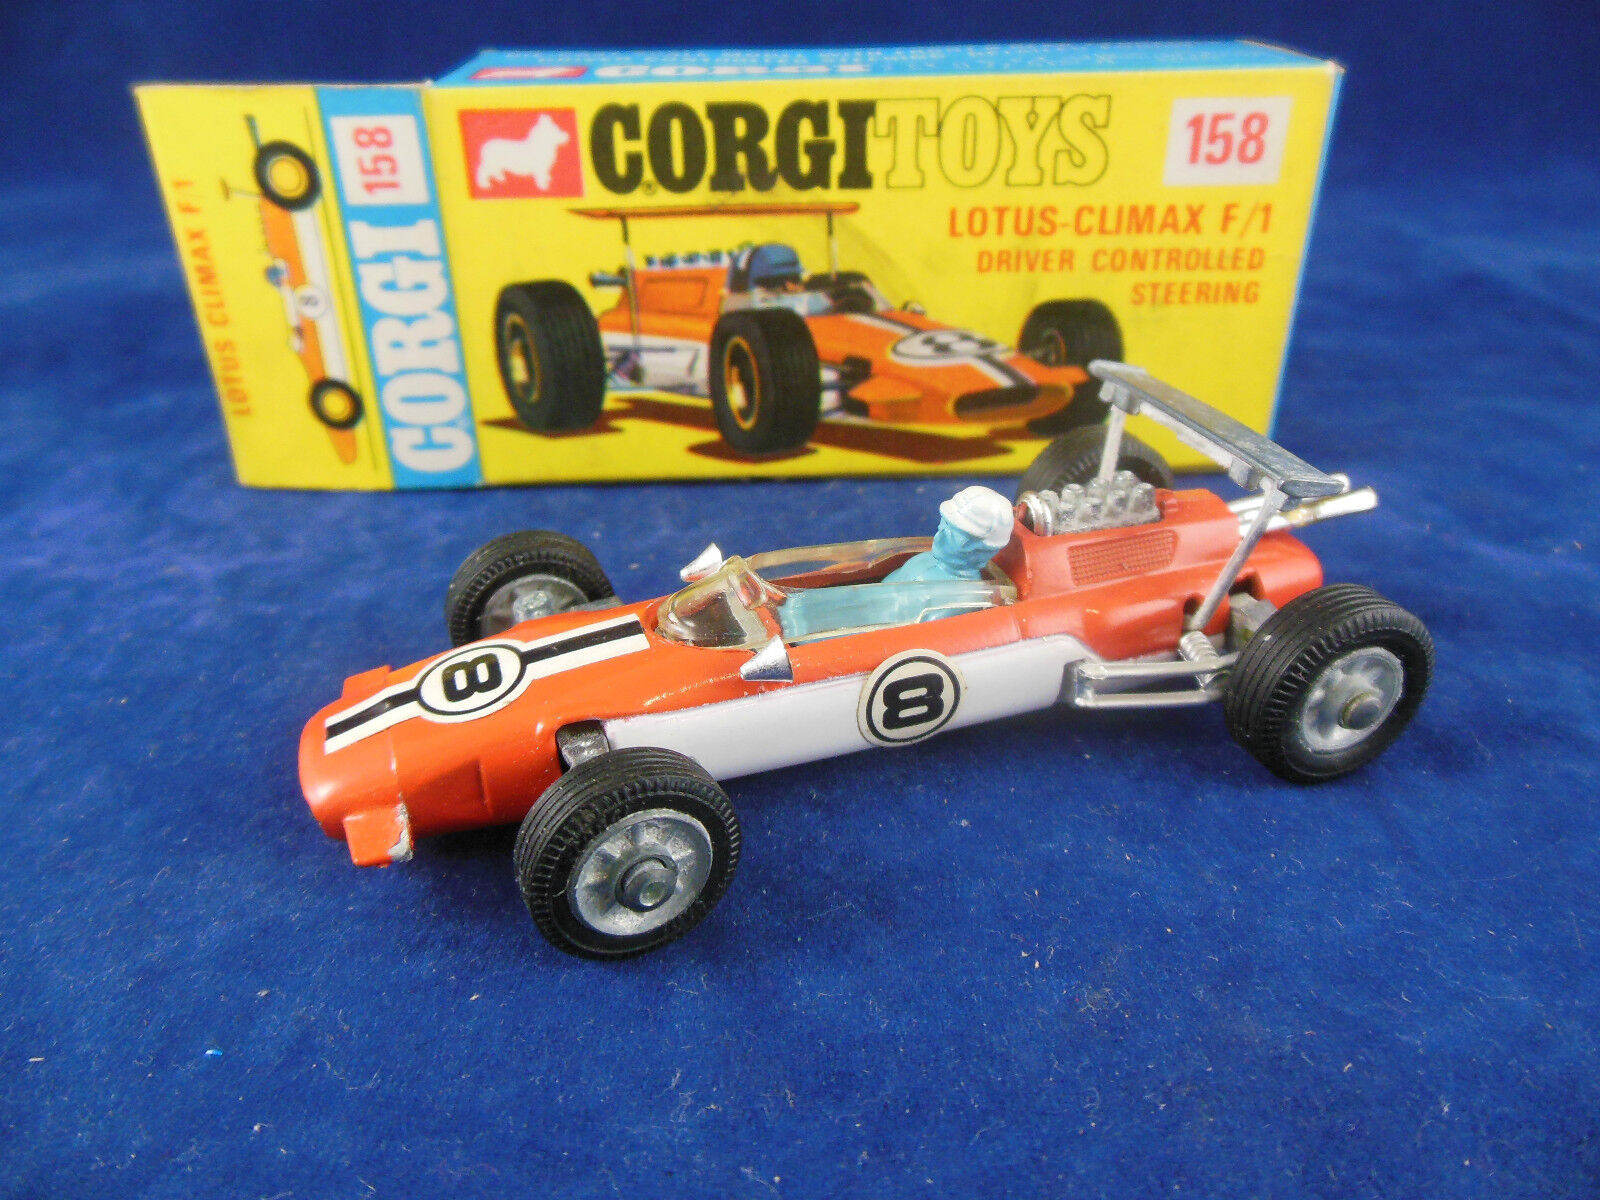 Corgi Toys 158 Lotus Climax controlador F 1 controlado volante cerca de nuevo, sin usar